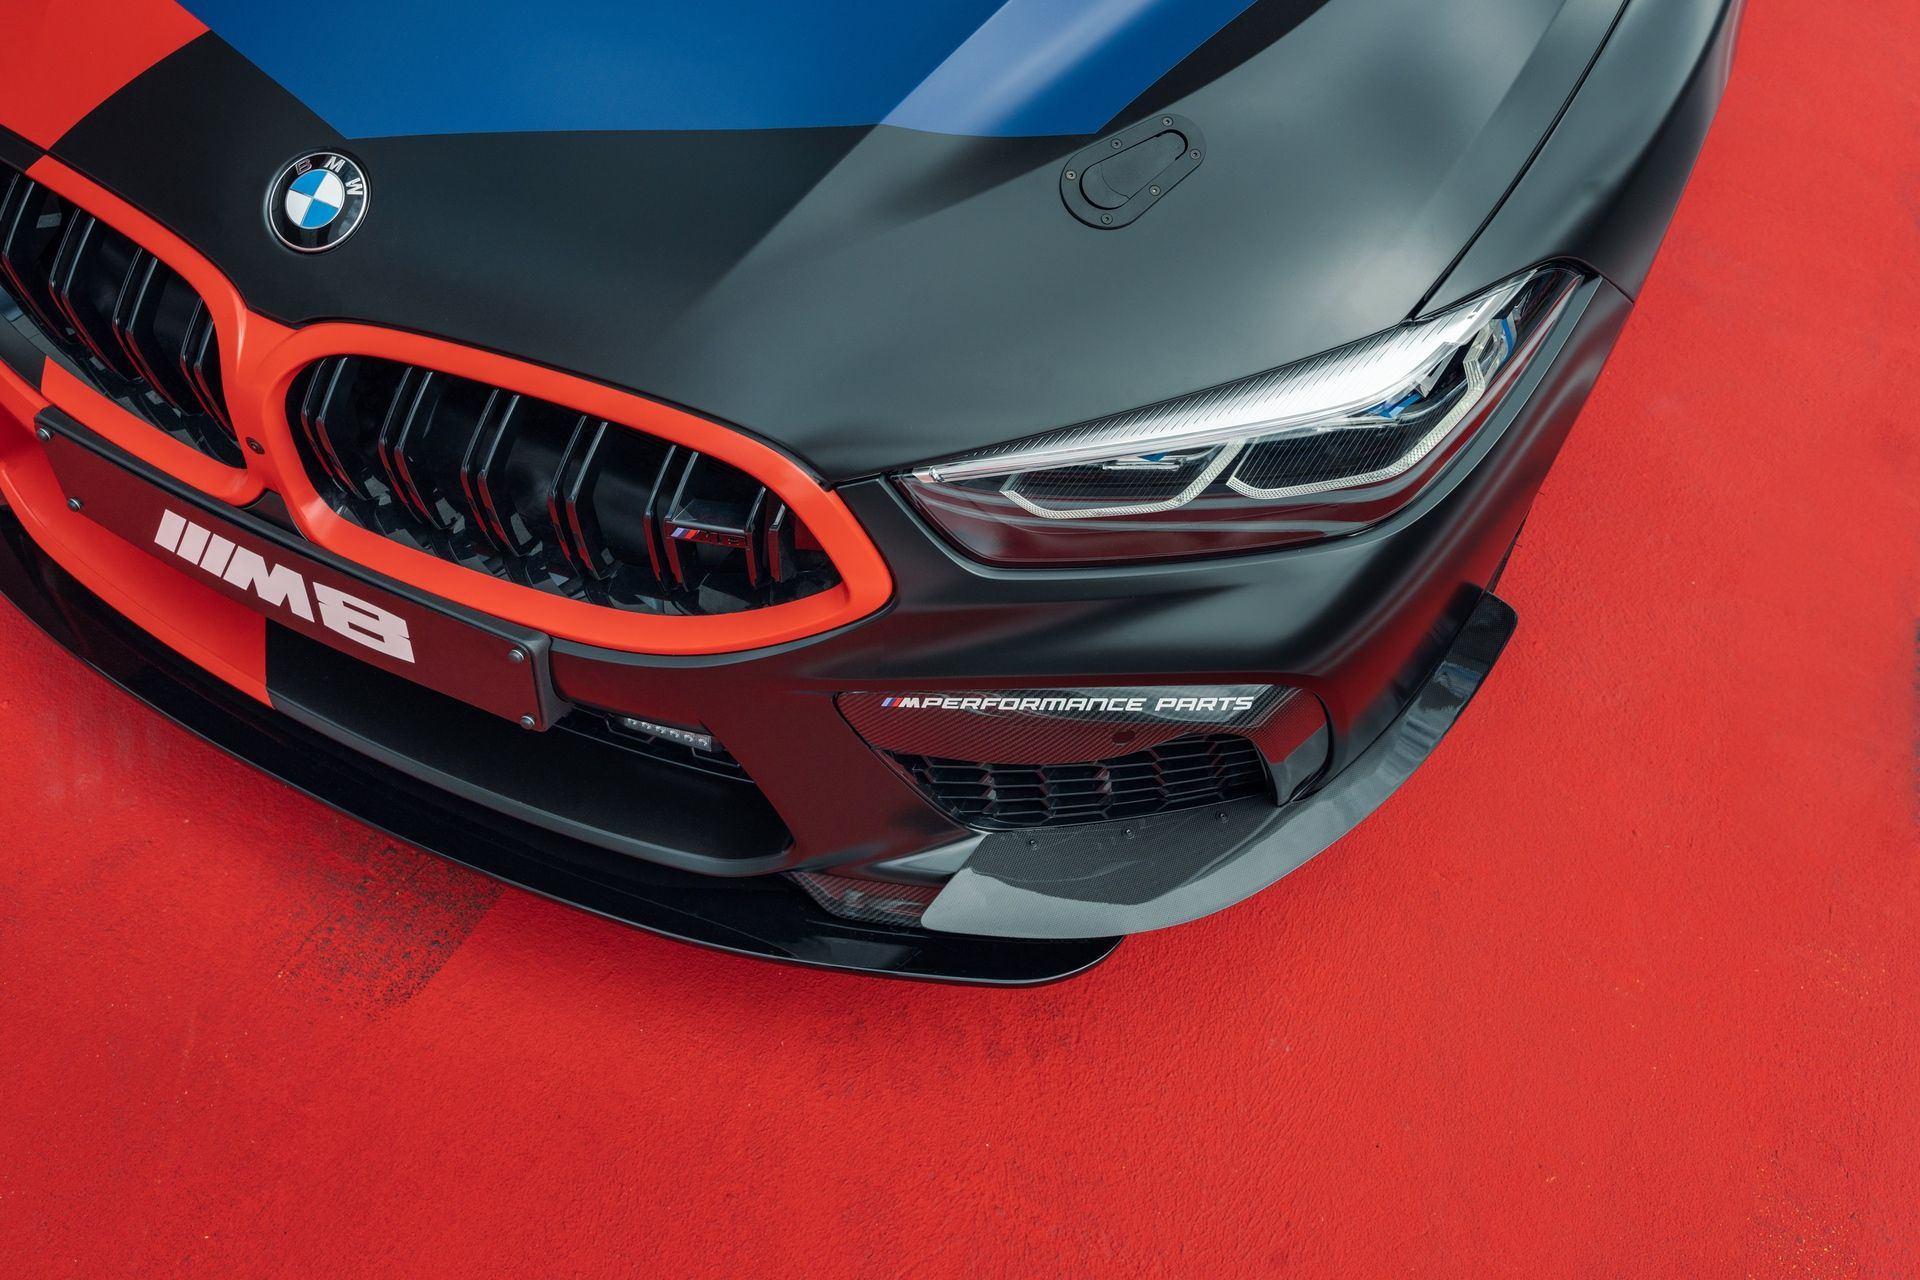 BMW_M8_Gran_Coupe_Safety_Car_MotoGP_0001